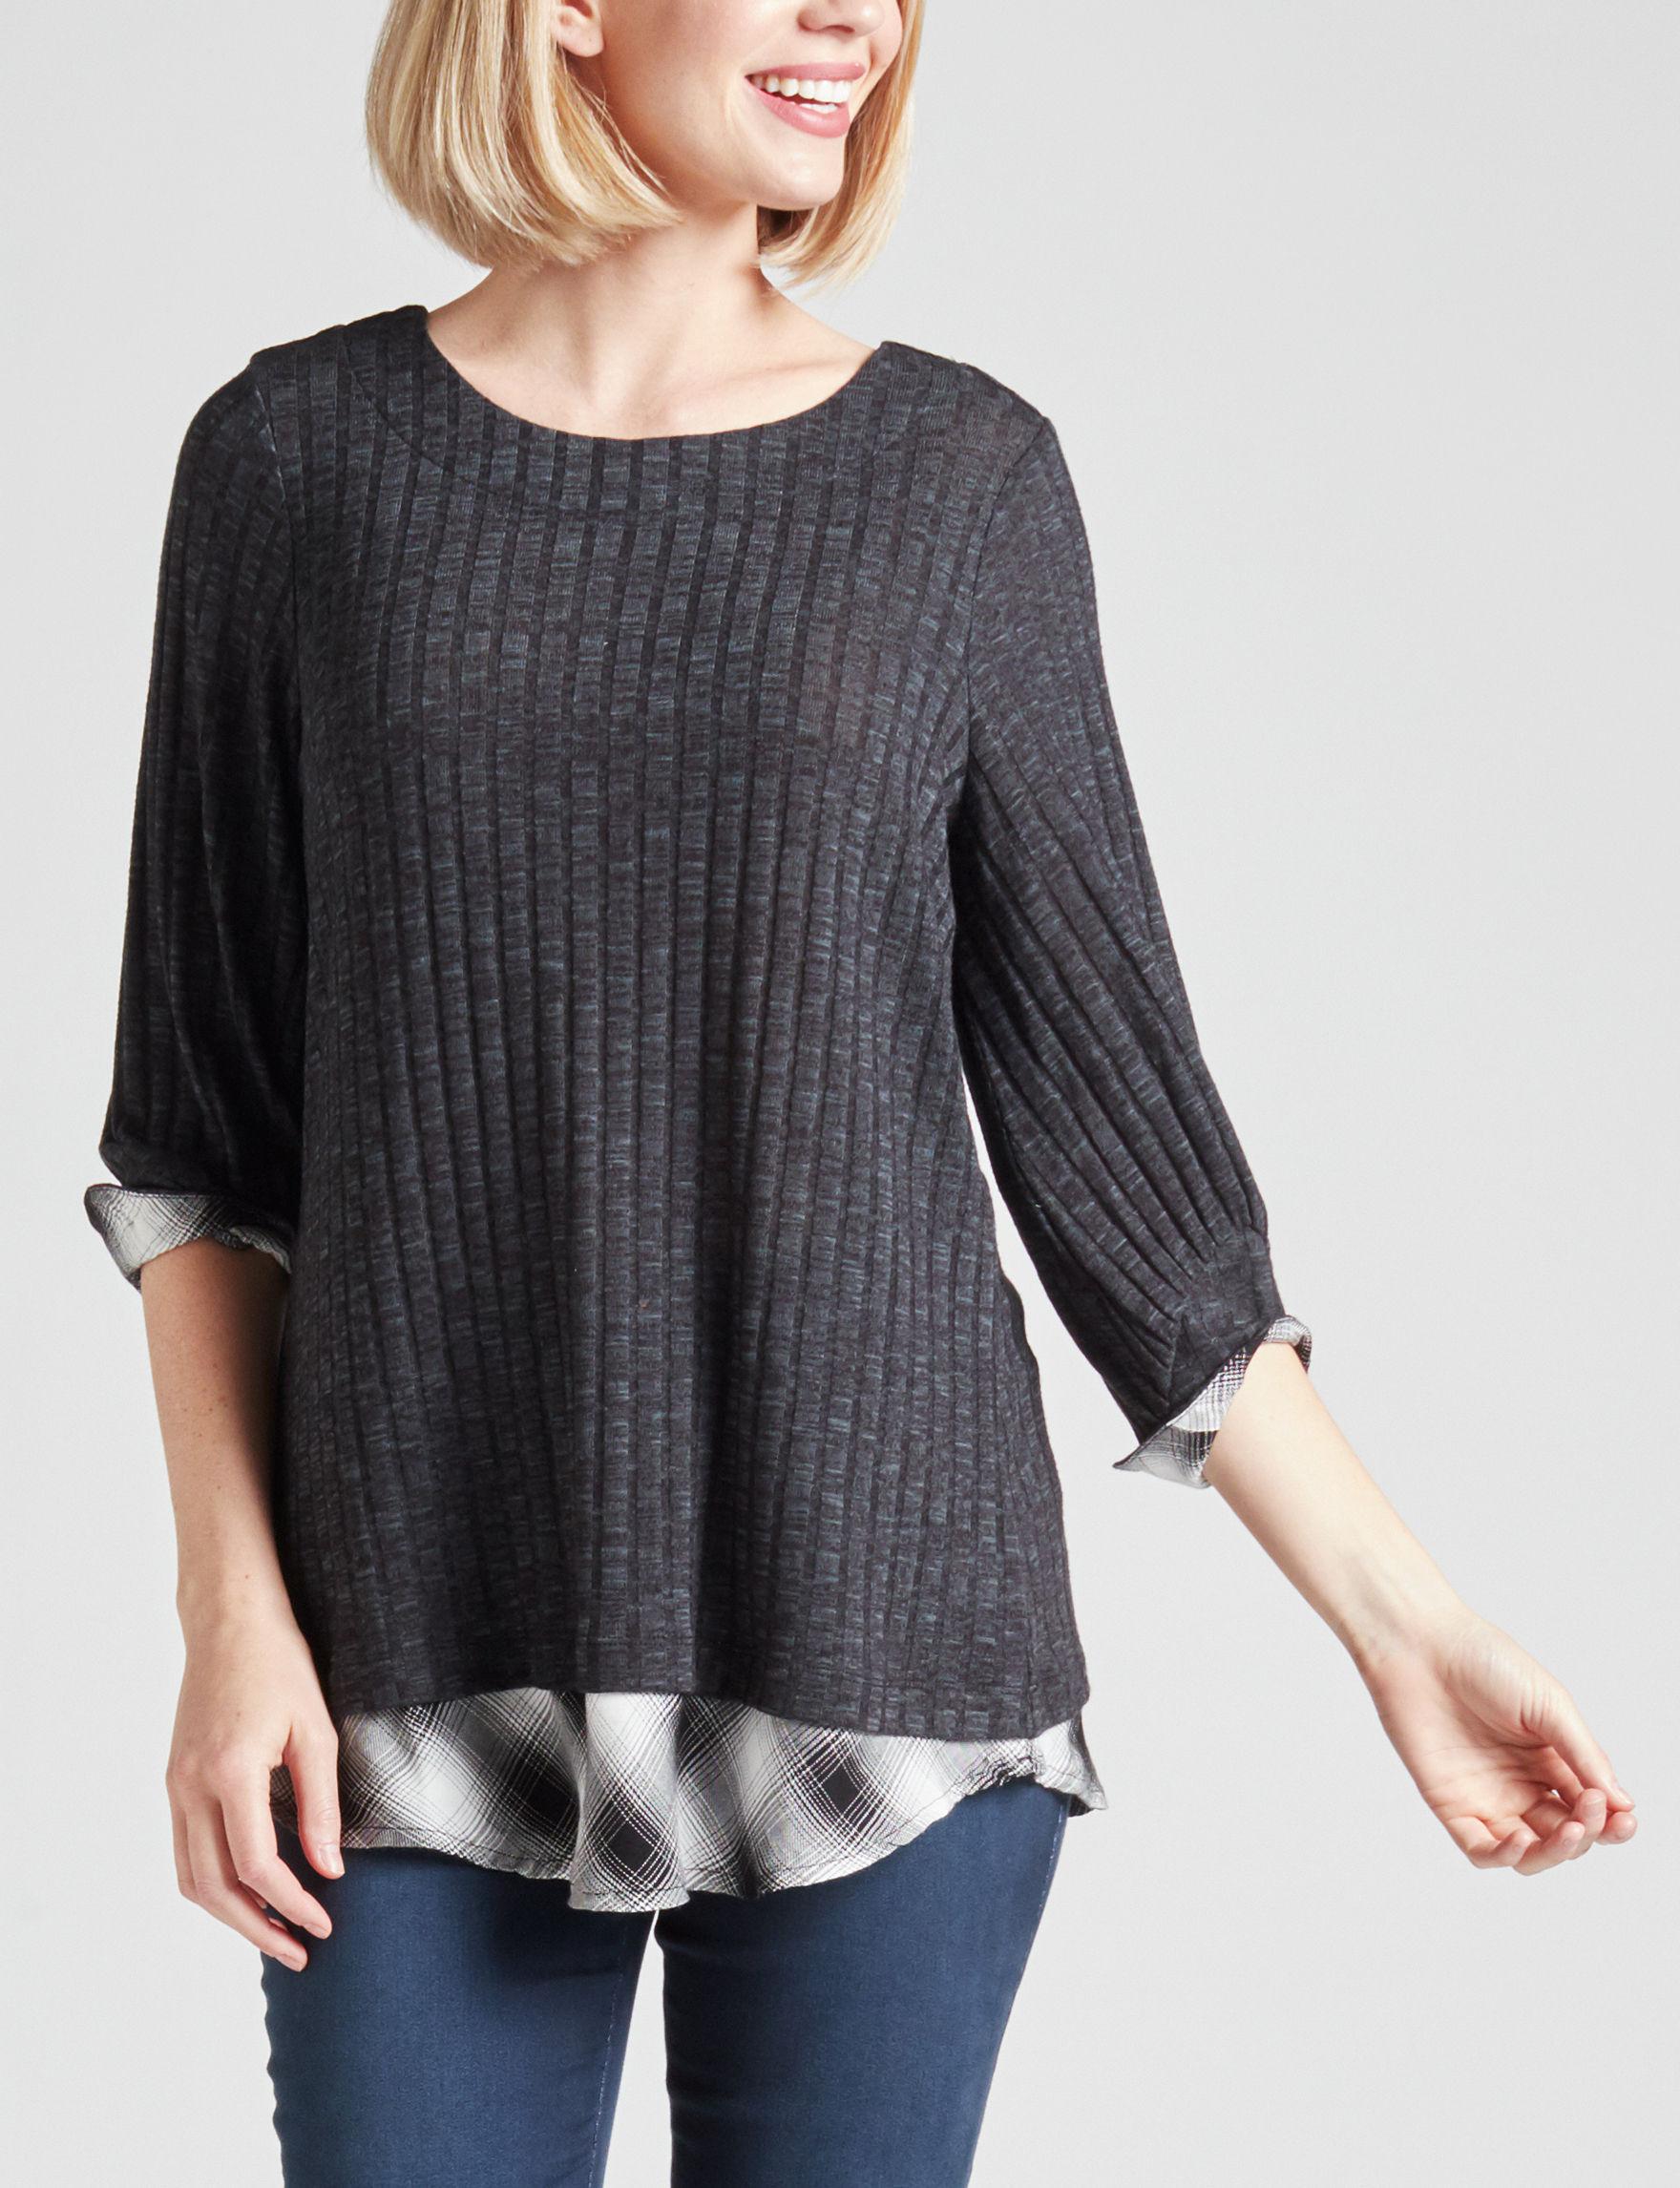 Energe Charcoal Shirts & Blouses